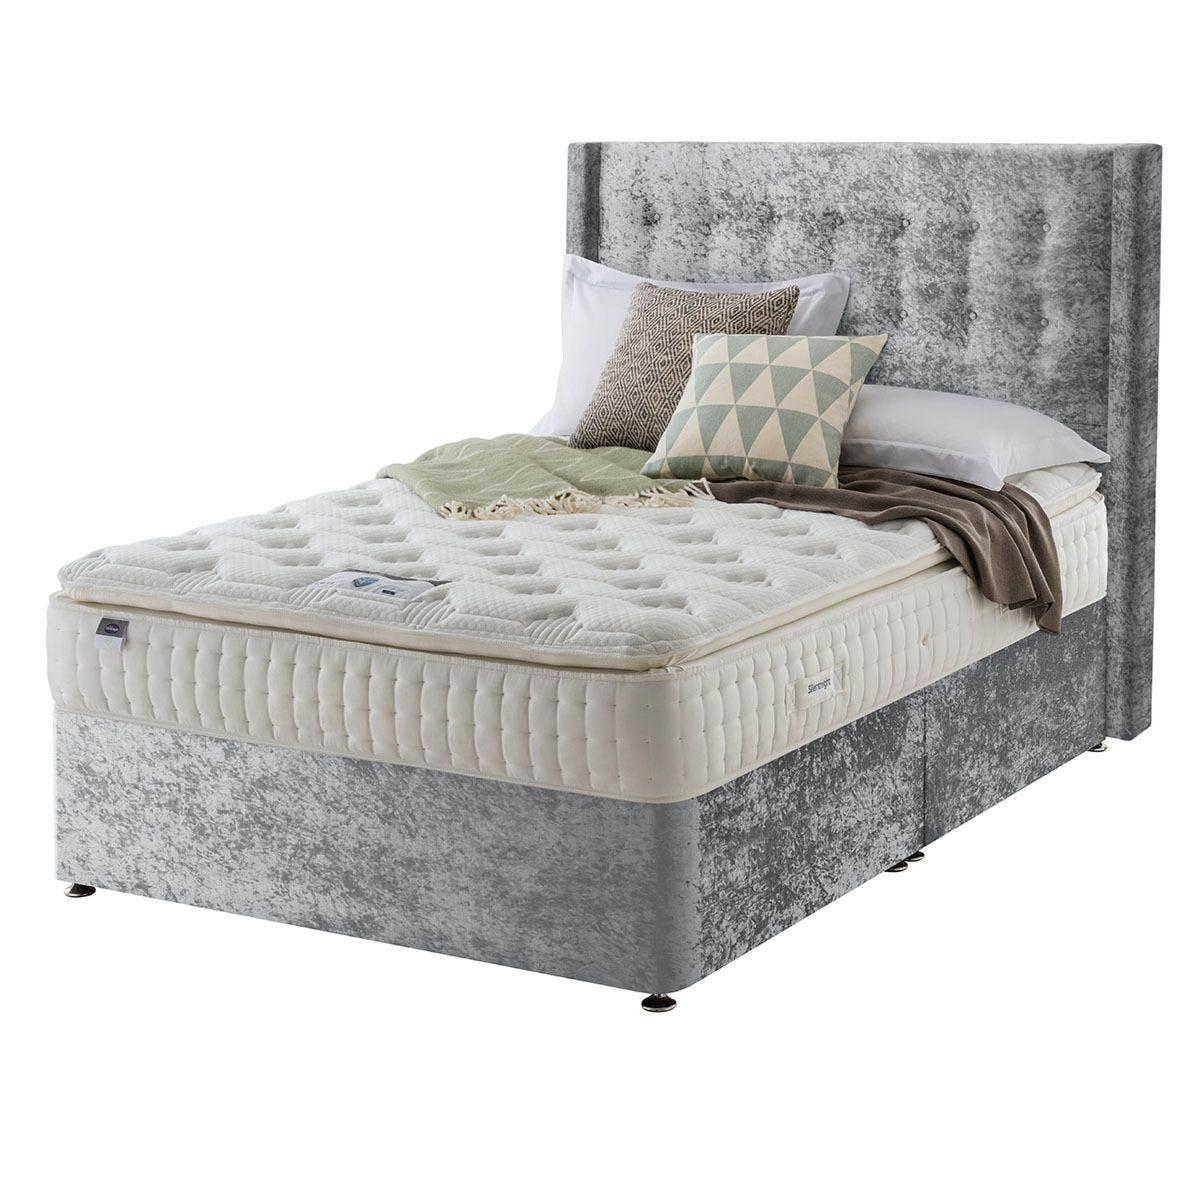 Silentnight Mirapocket Latex 1000 Non Storage Divan Bed - Crushed Velvet Light Grey King